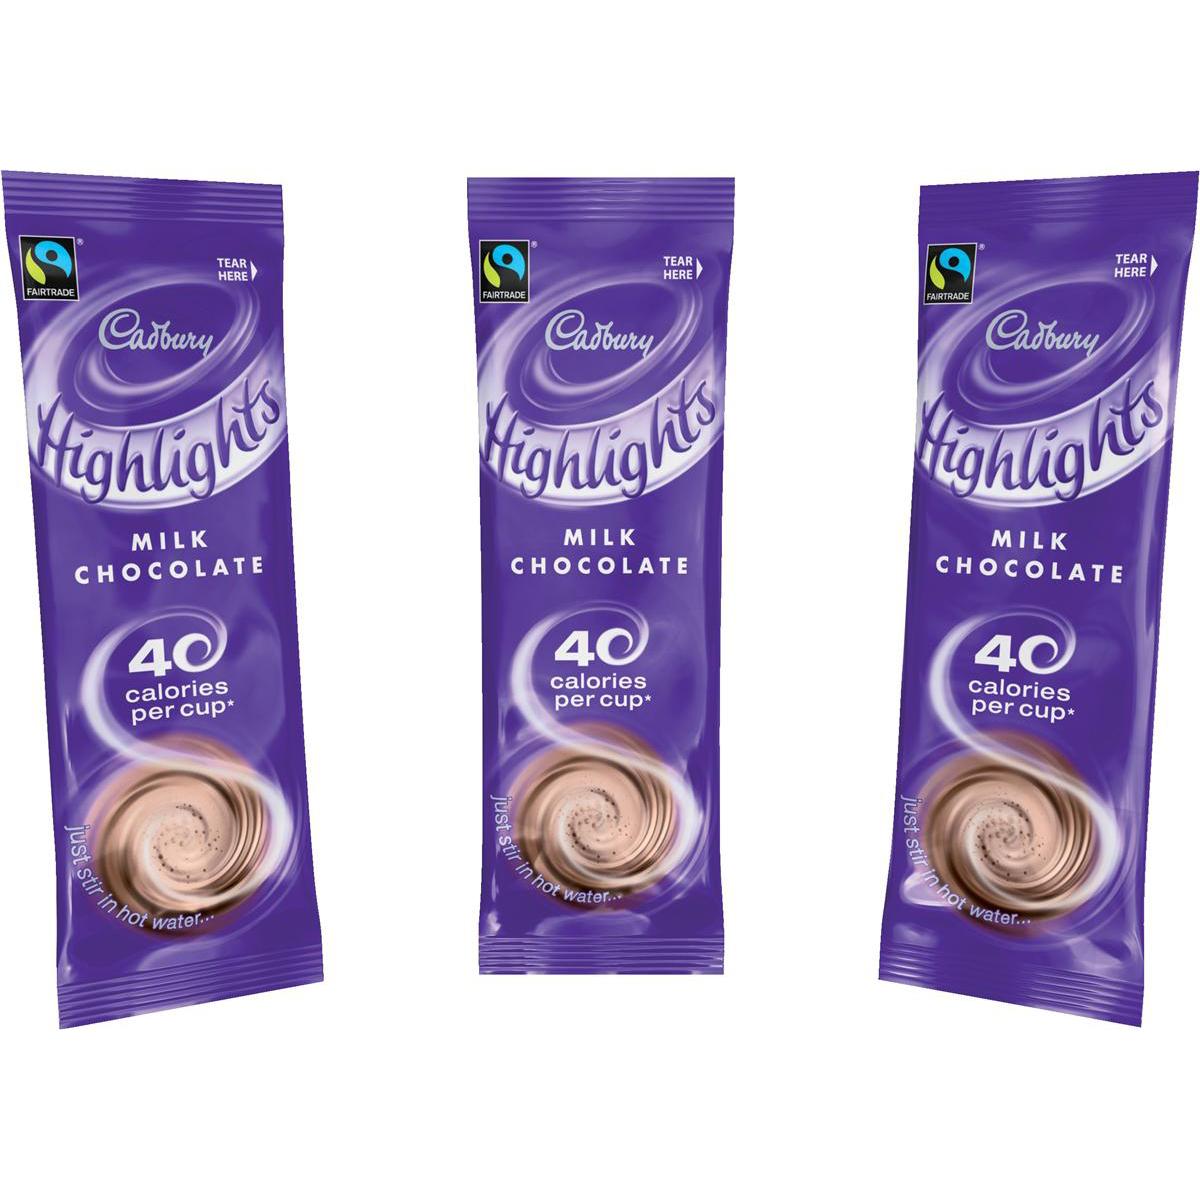 Cadbury Chocolate Highlights Fairtrade Hot Chocolate Powder Sachets Low Calorie Ref 0403173 [Pack 30]